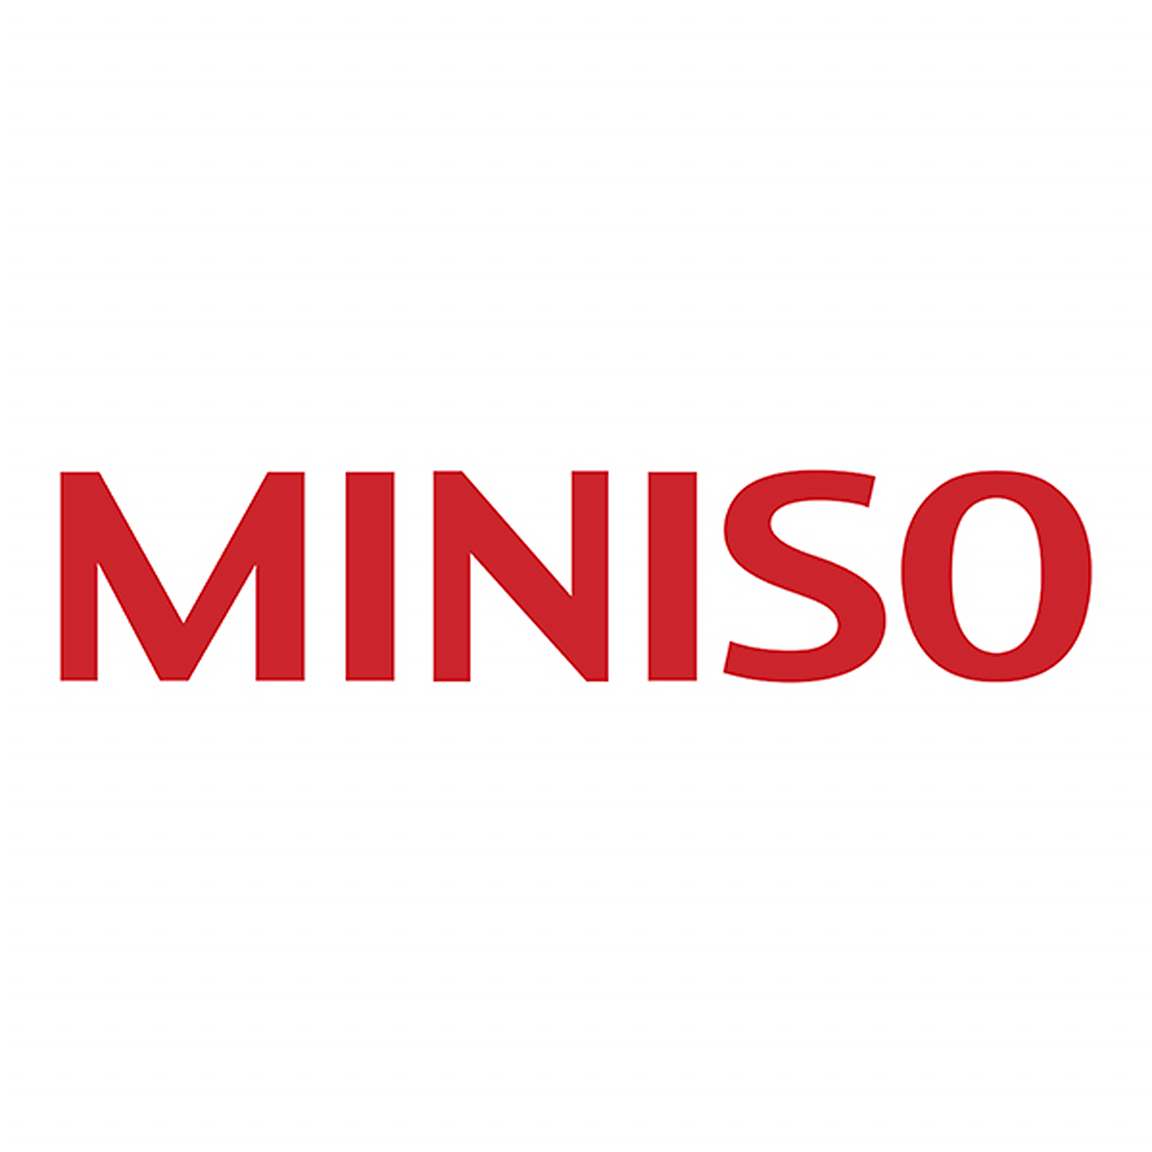 miniso-logo